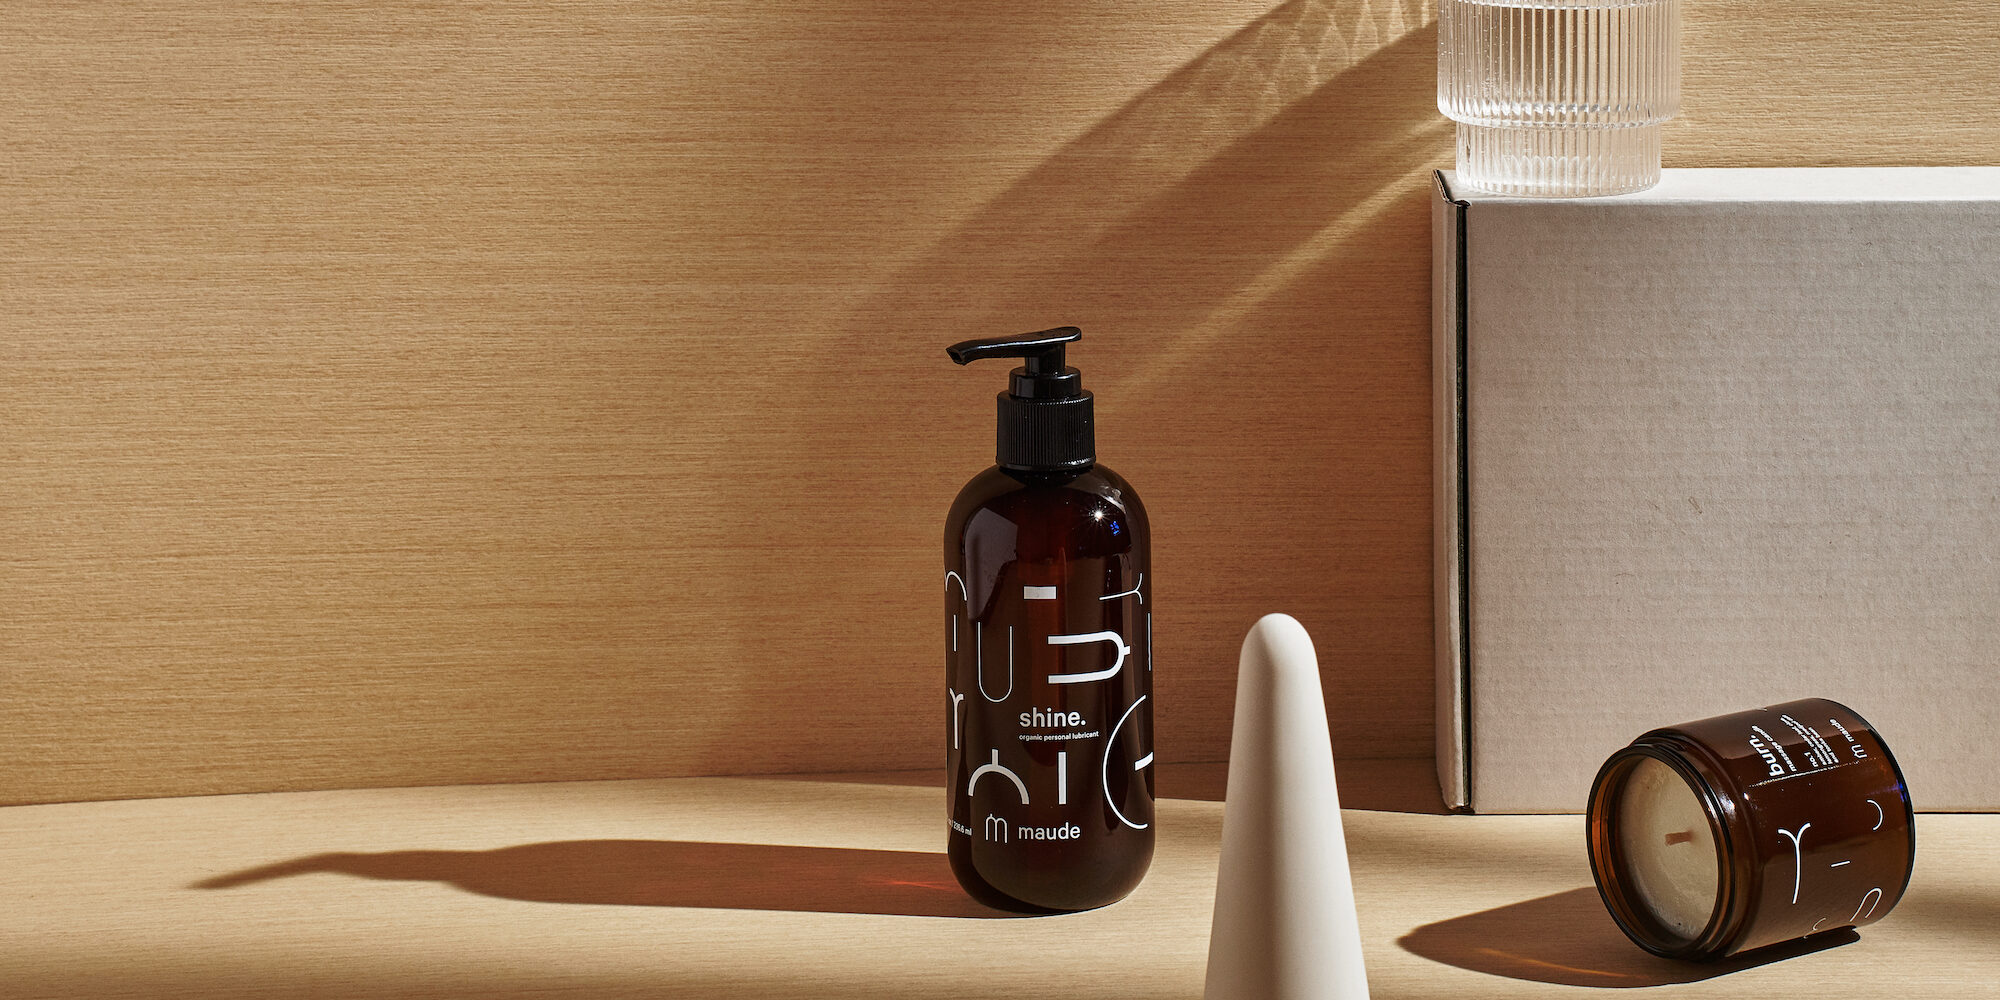 Prestige Department Store Bloomingdale's Launches Sexual Wellness Assortment Online